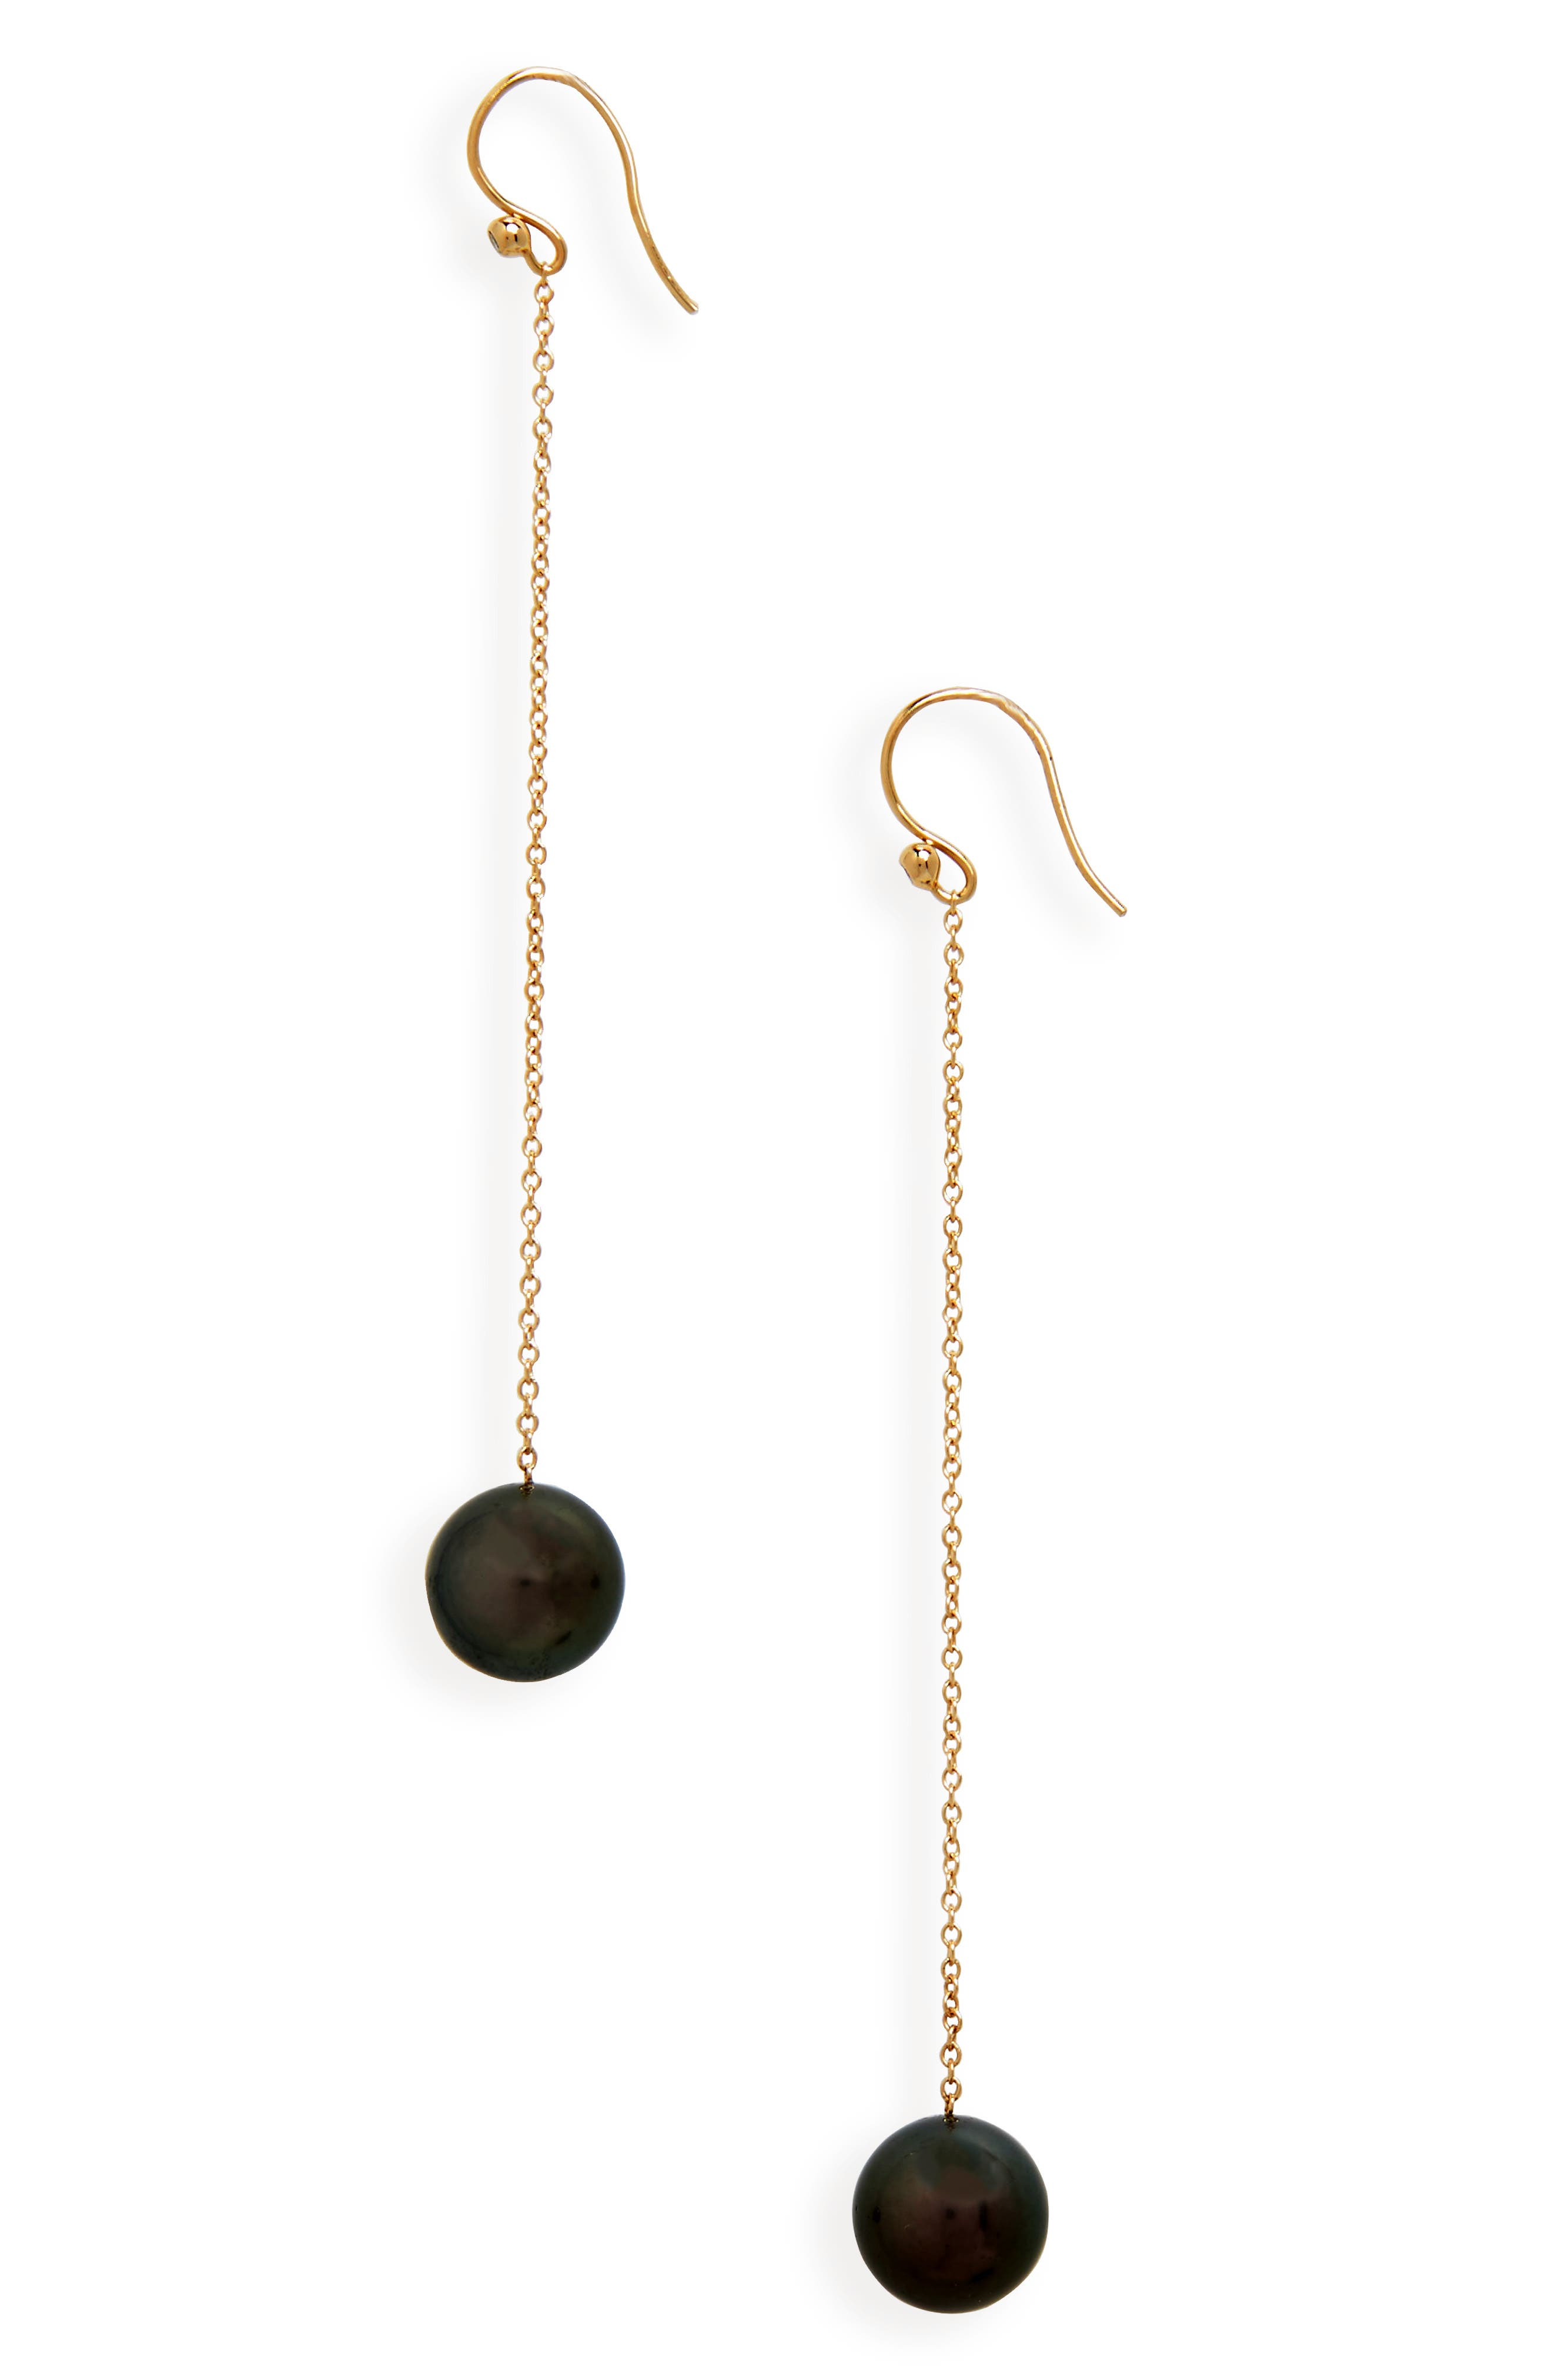 Tahitian Pearl Chain Drop Earrings,                         Main,                         color, YELLOW GOLD/ BLACK PEARL